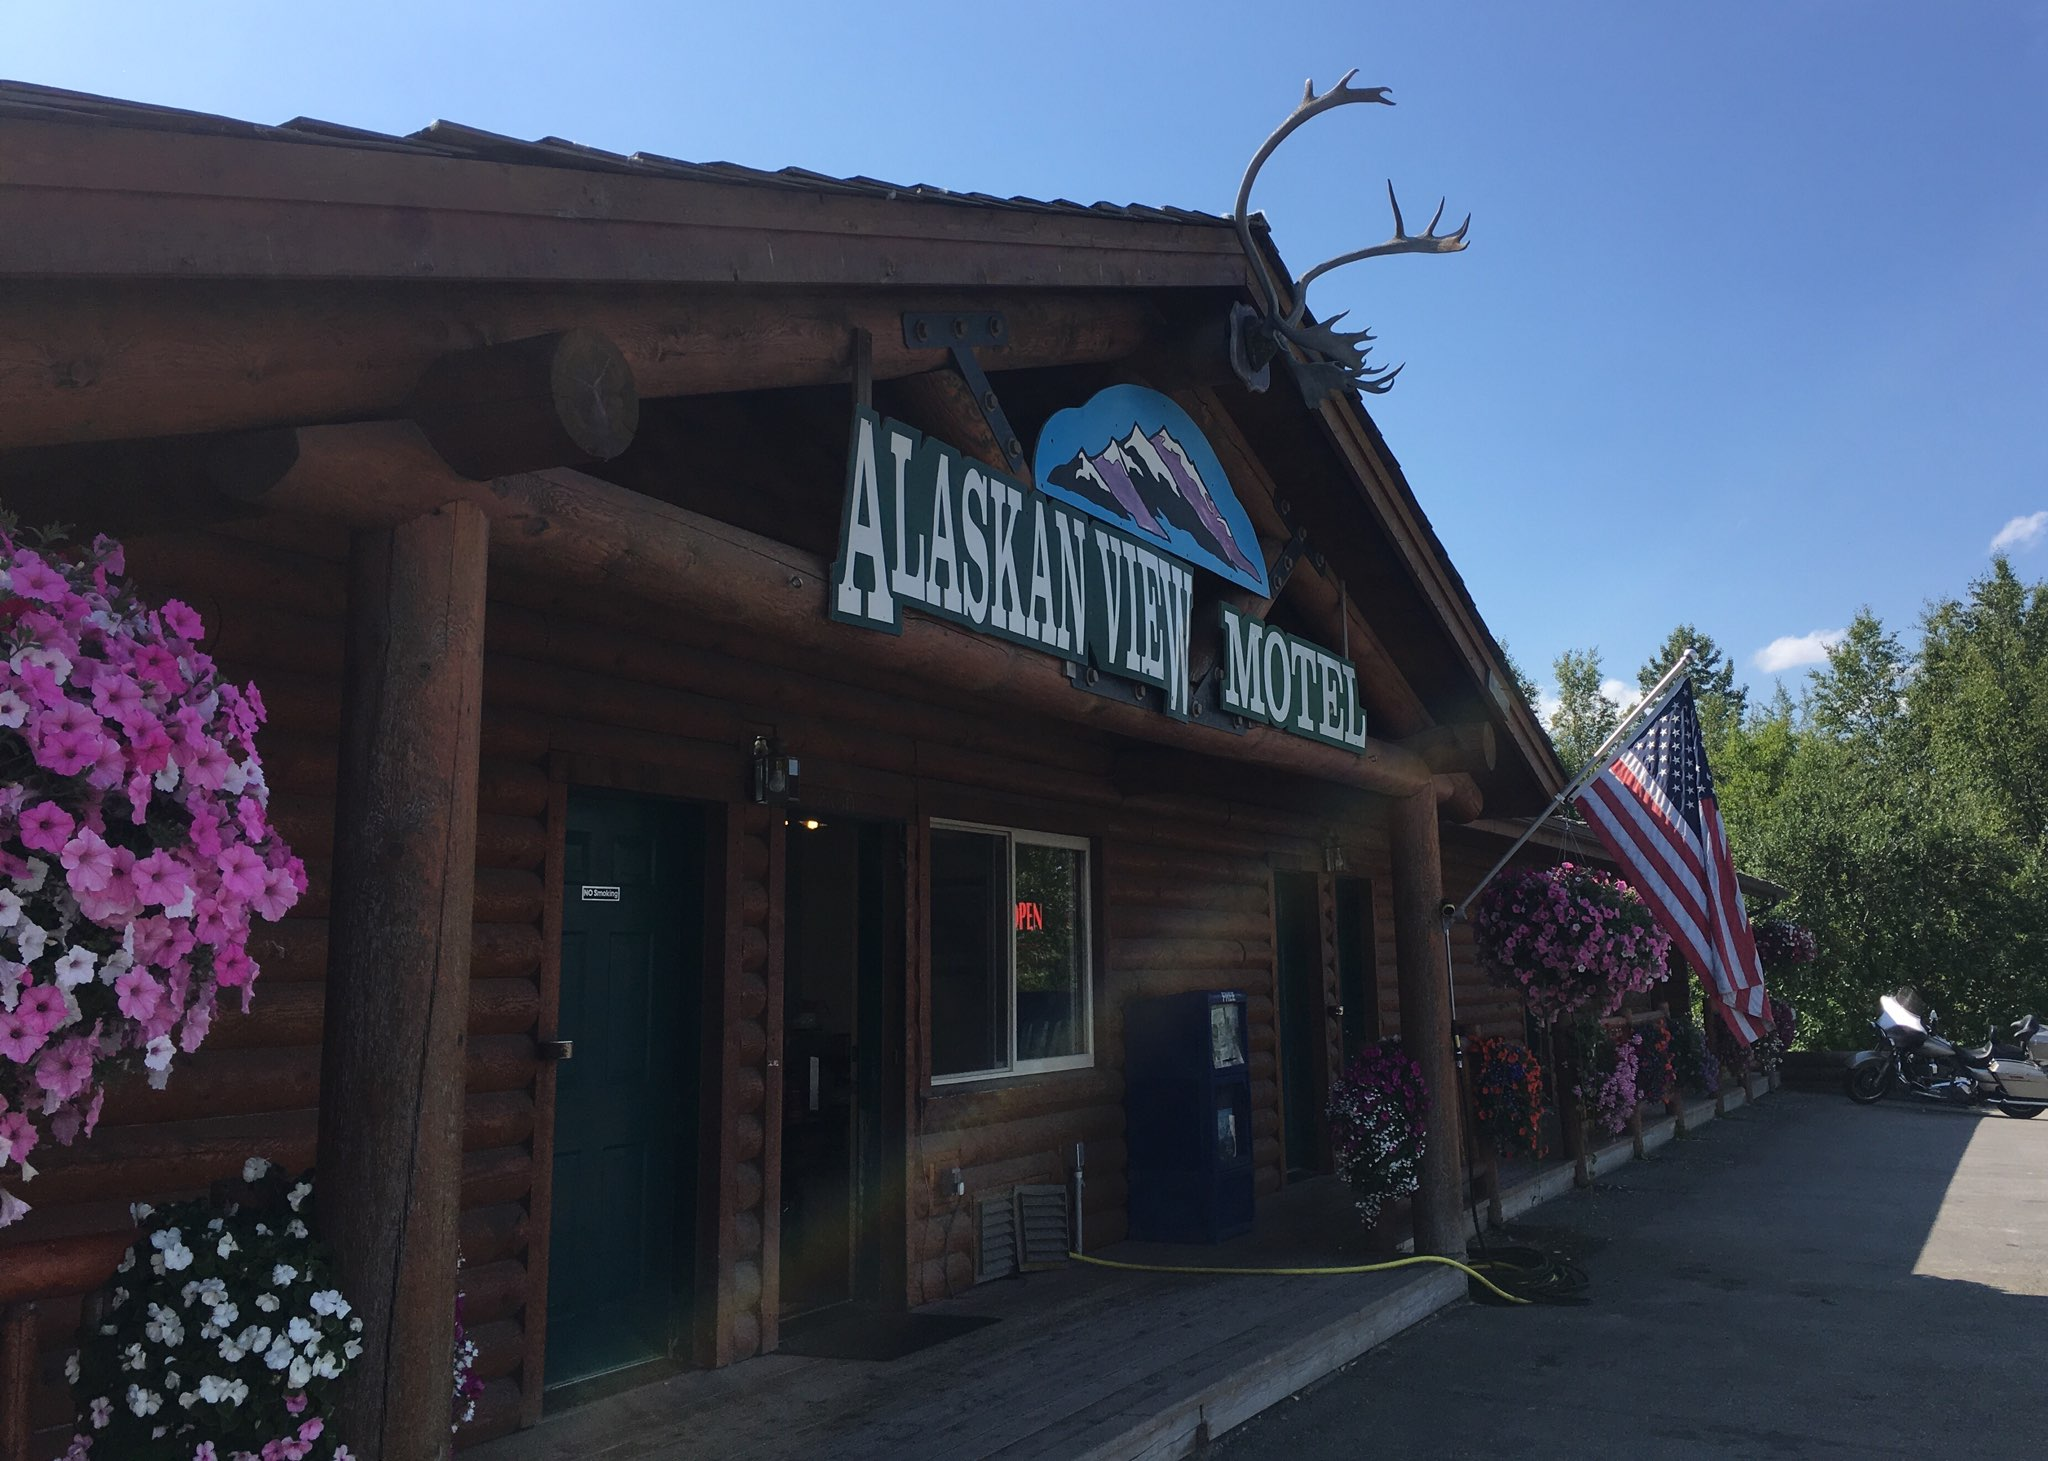 Alaskan View Motel En Route To Denali National Park 2650 E Parks Highway Wasilla Alaska 99654 Mile 40 Minute Drive North Of